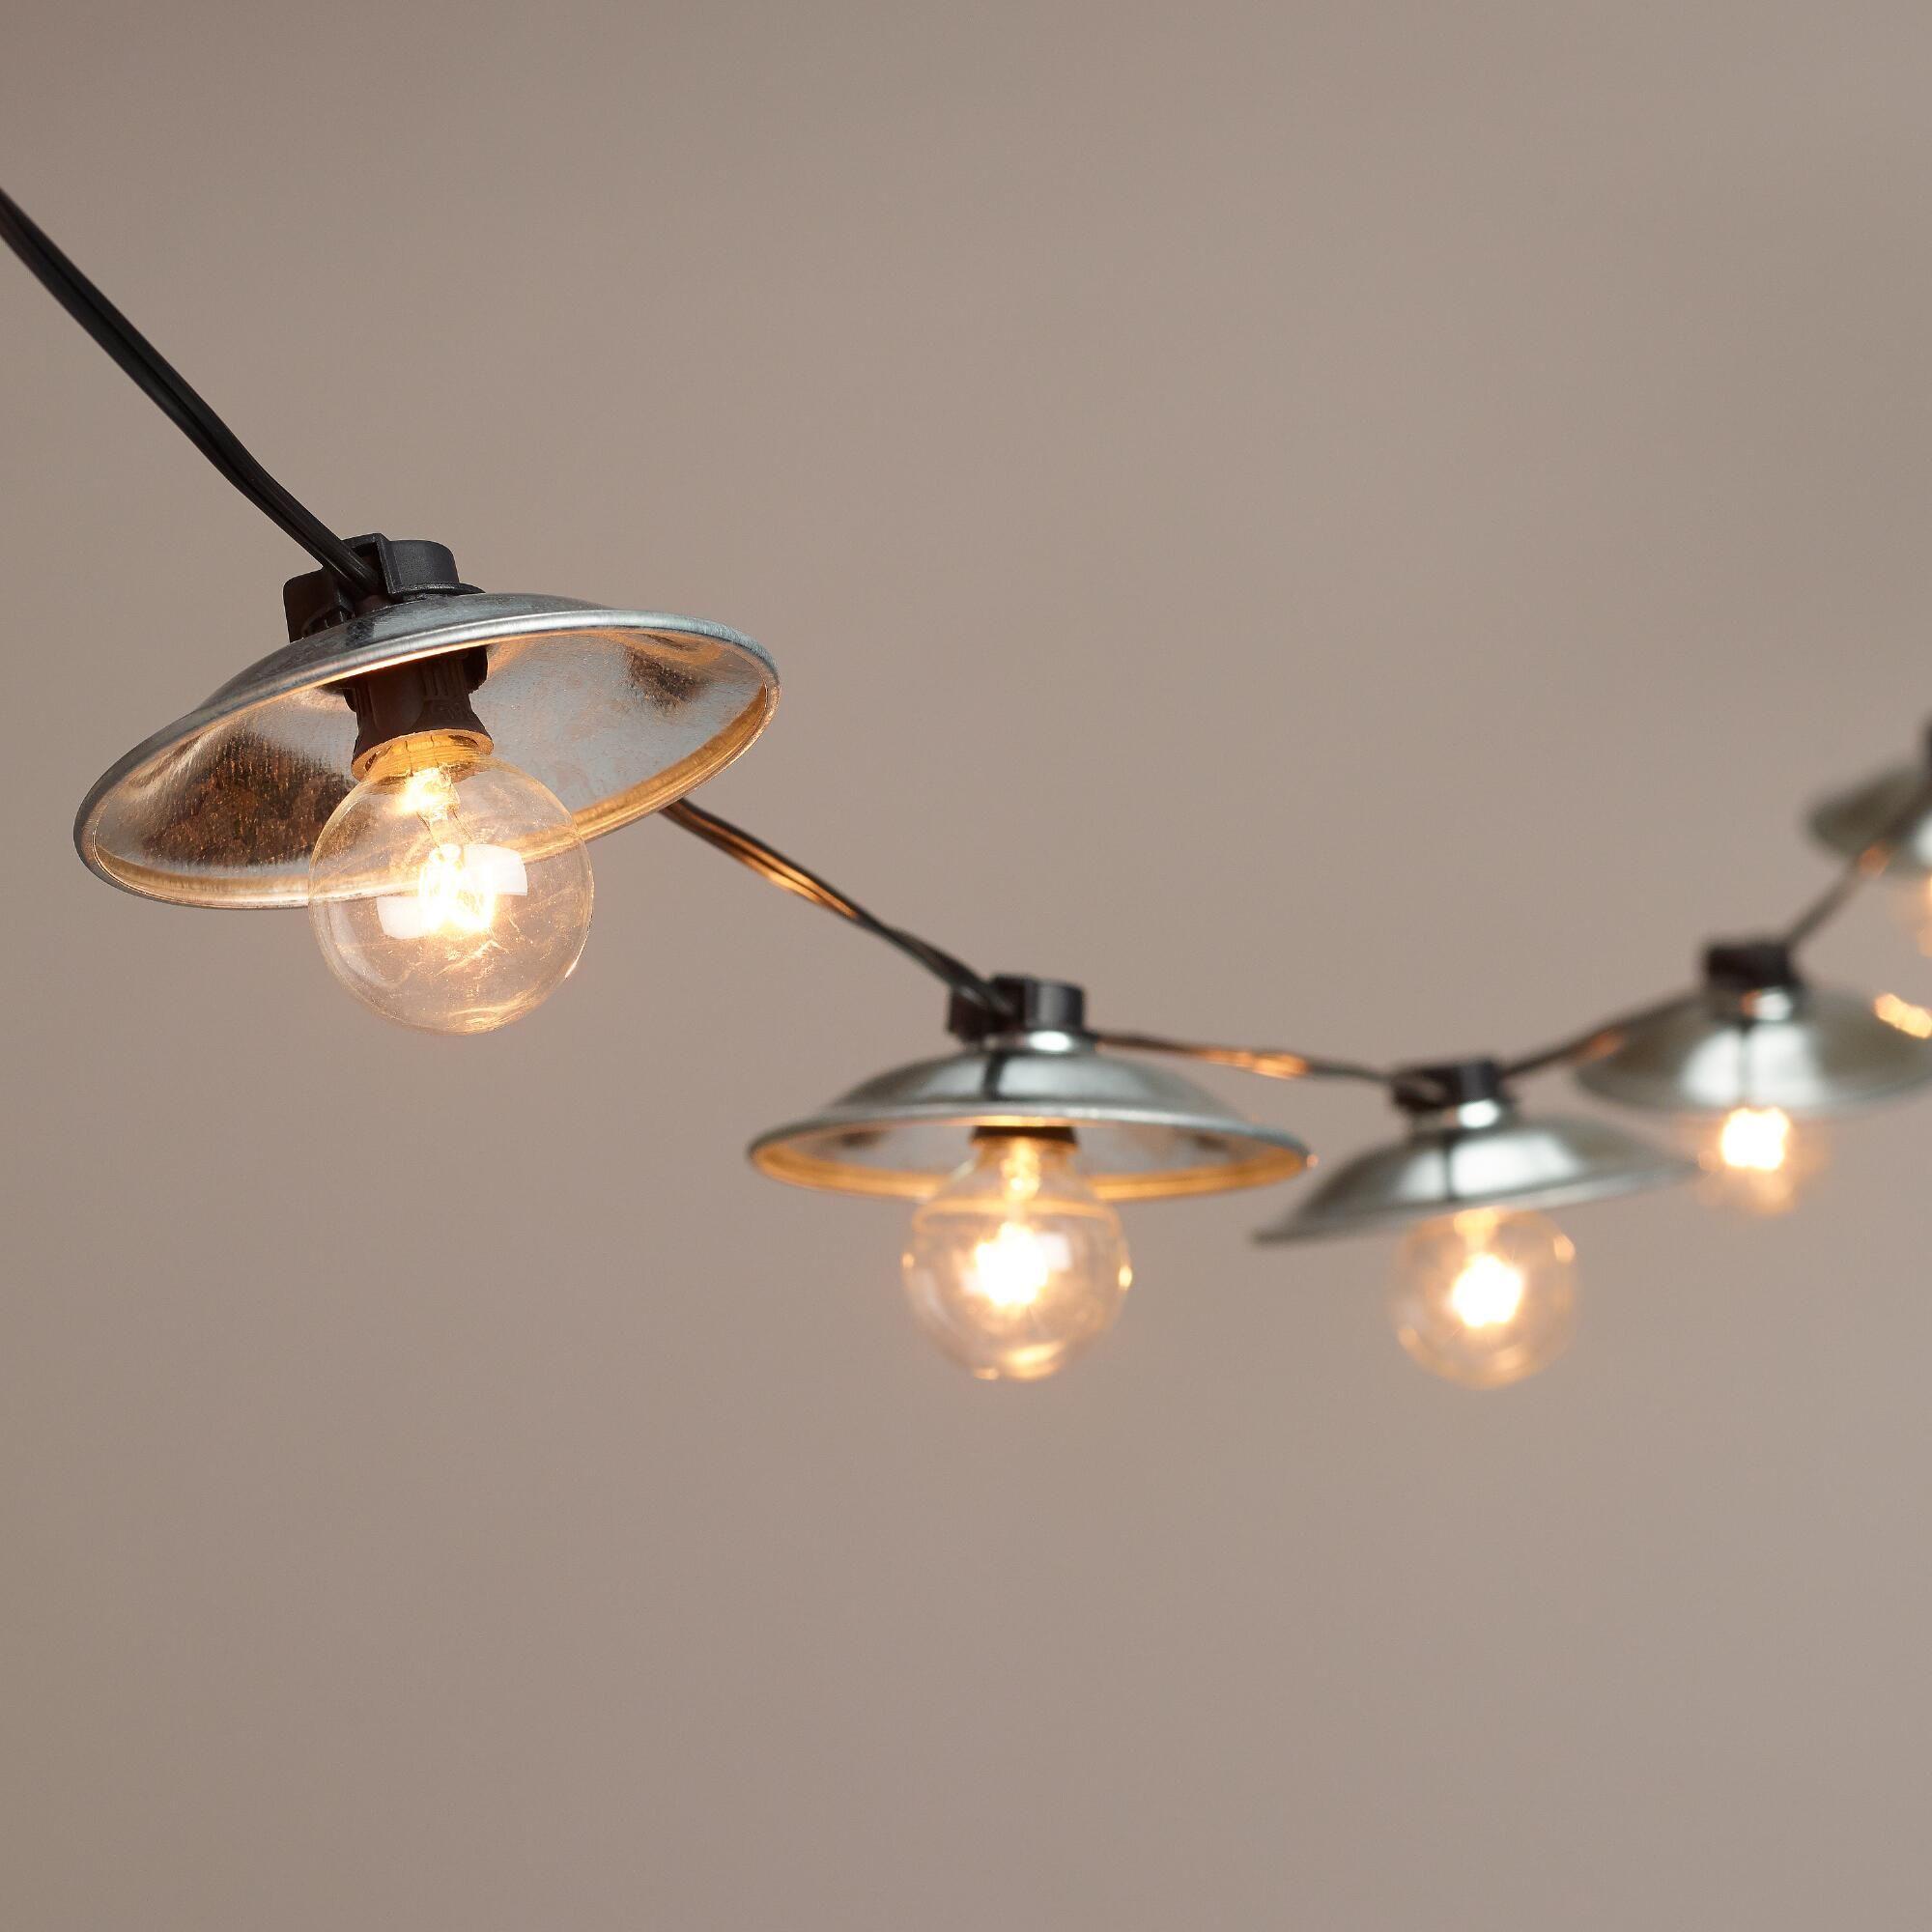 cost plus world market on wondermall - cafe 10-bulb string lights